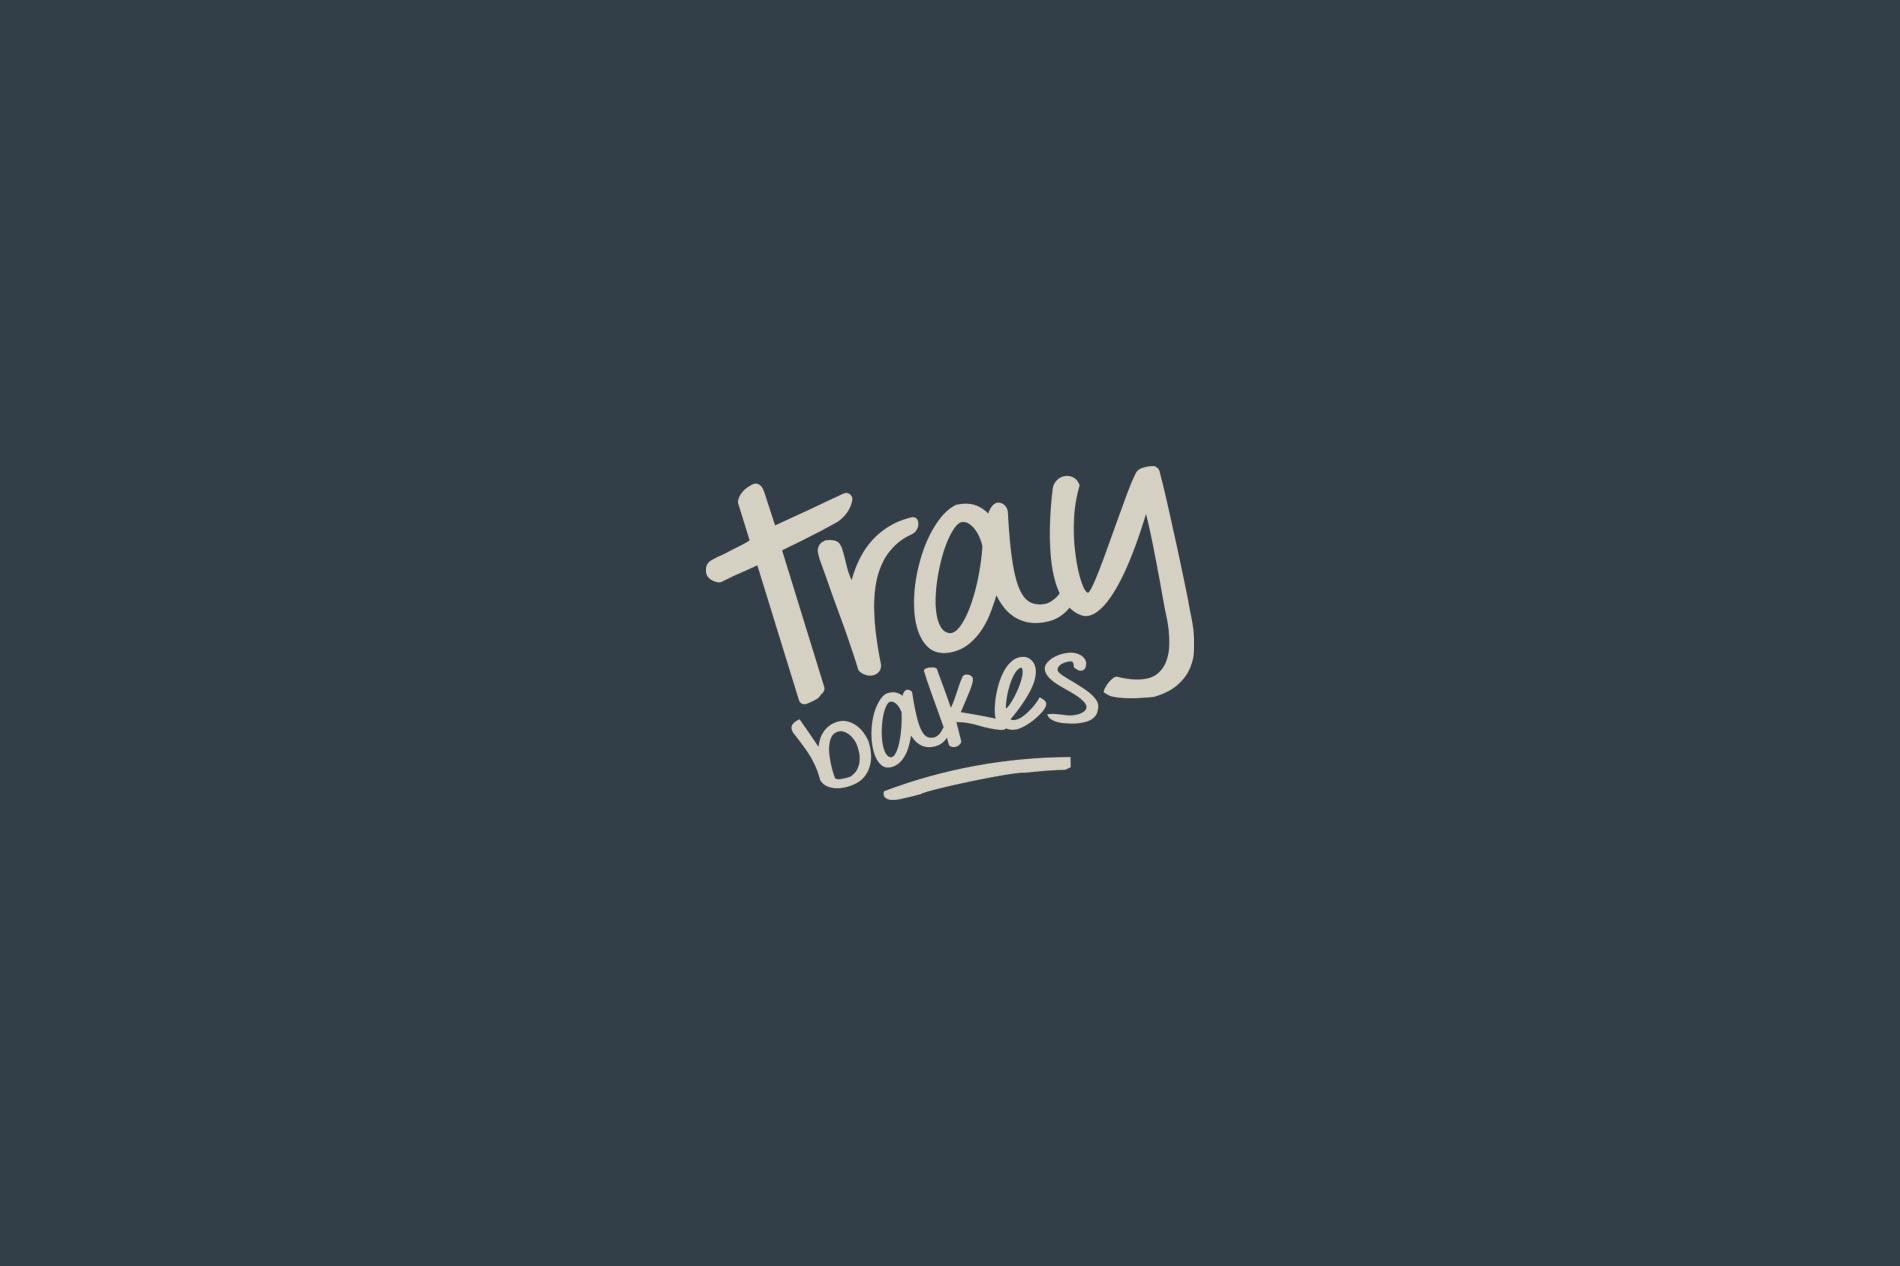 Traybakes logo design, branding